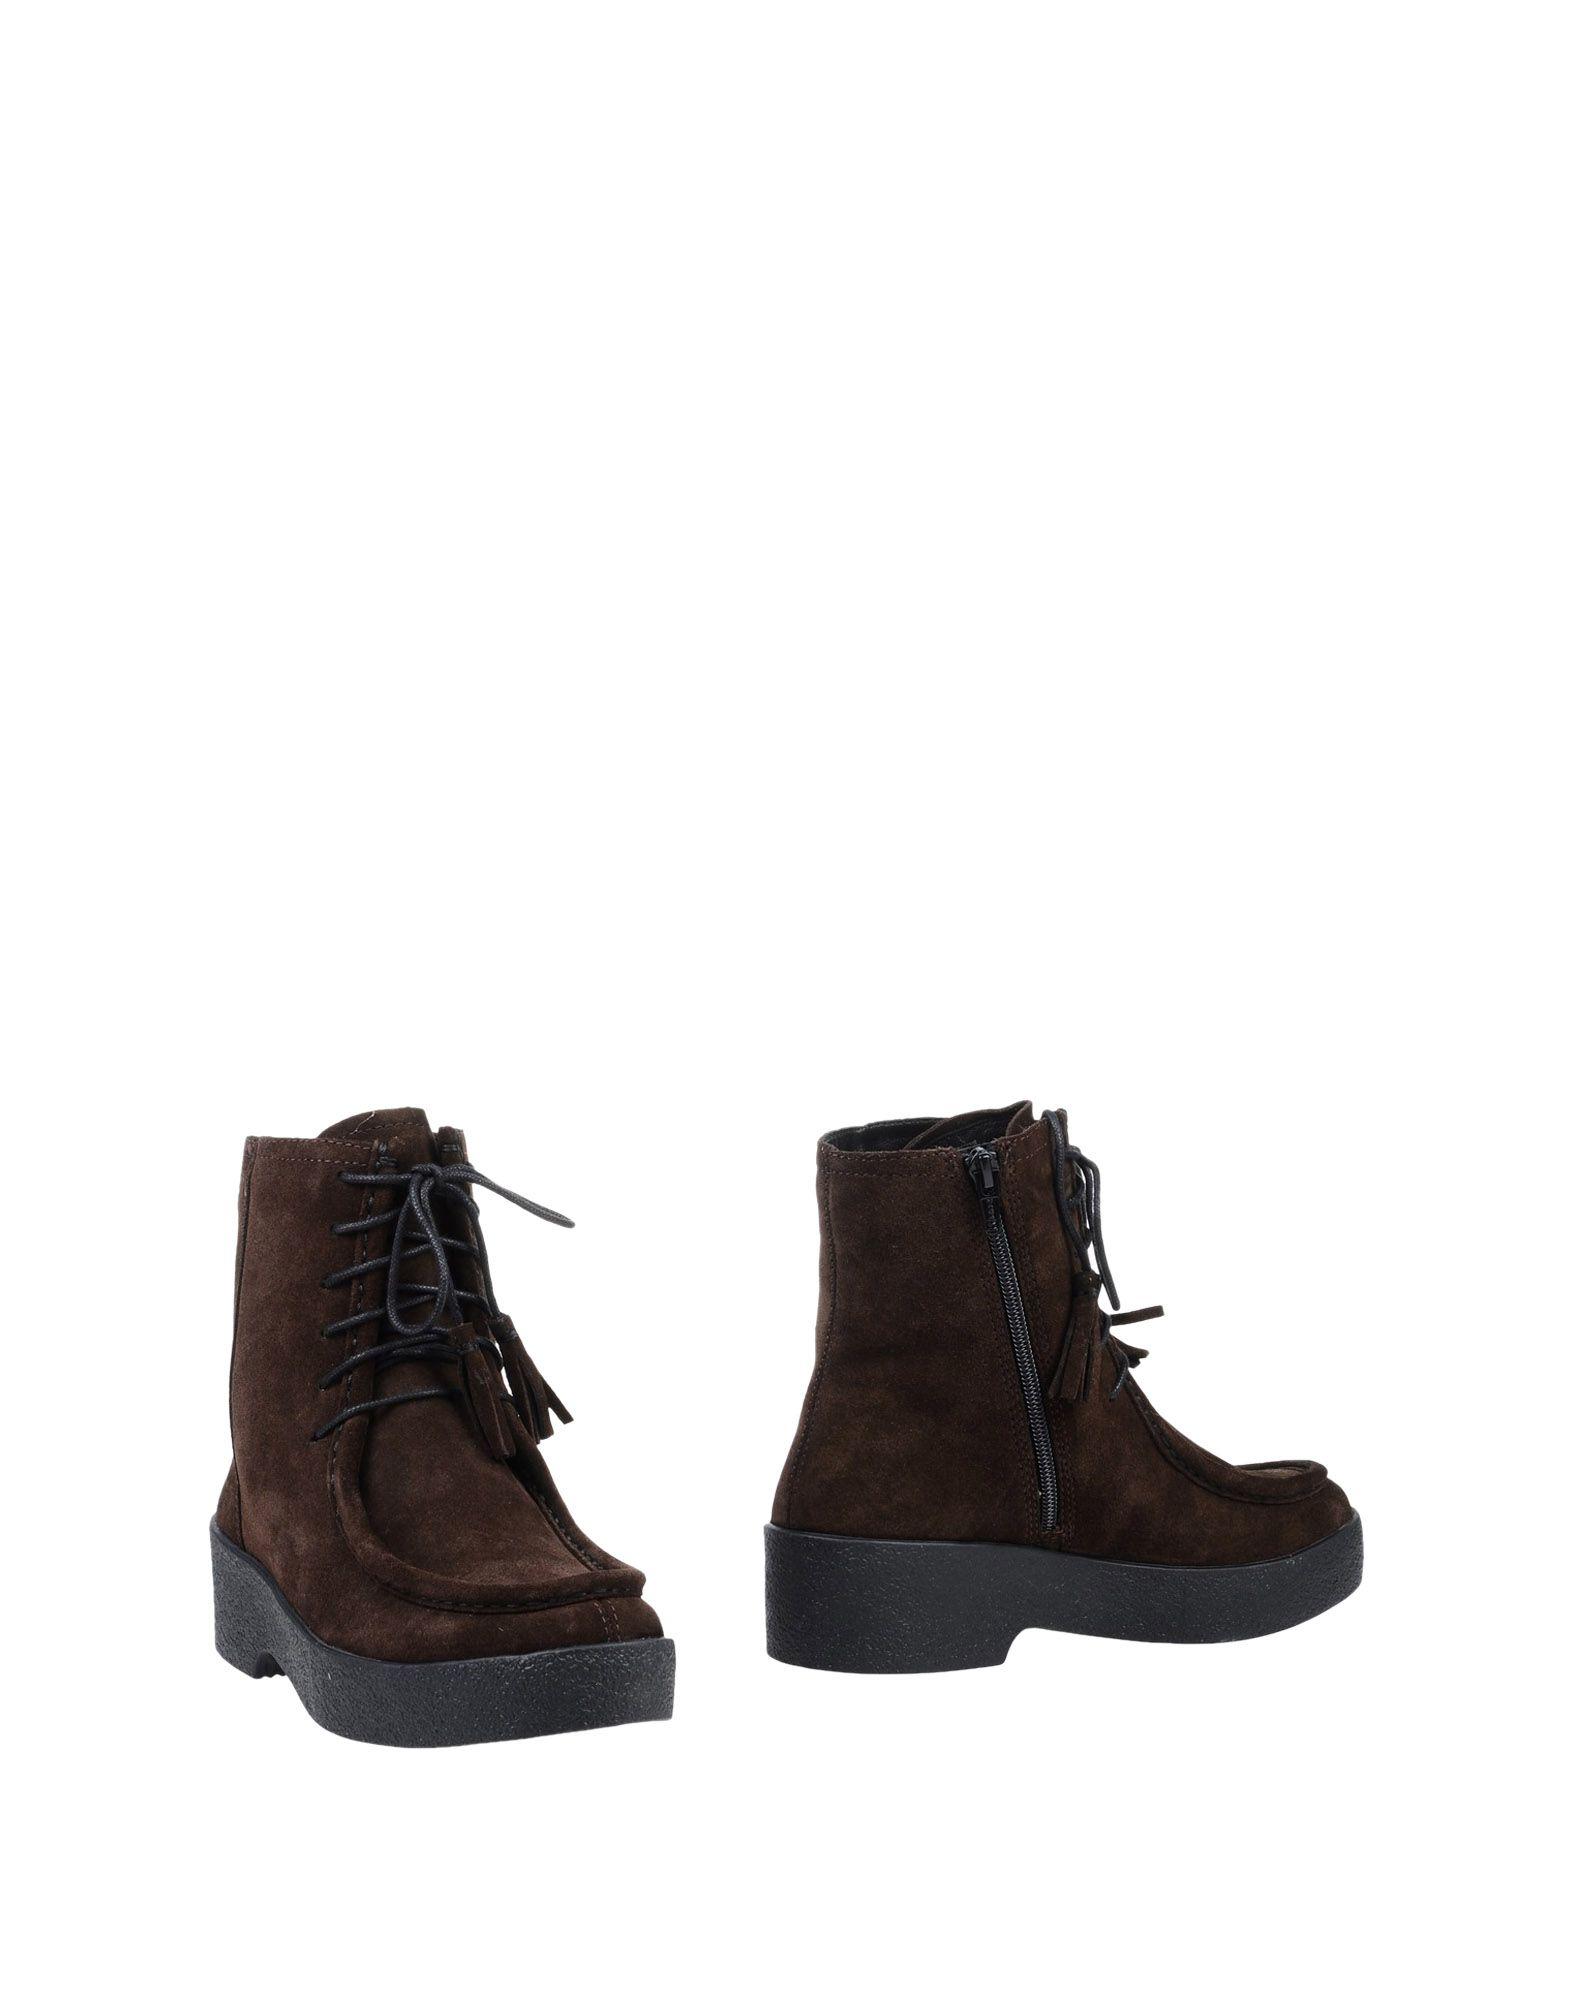 Negro Botín Vagabond Zapatosmakers Mujer - Botines Botines Botines Vagabond Zapatosmakers Zapatos casuales salvajes aa40ab